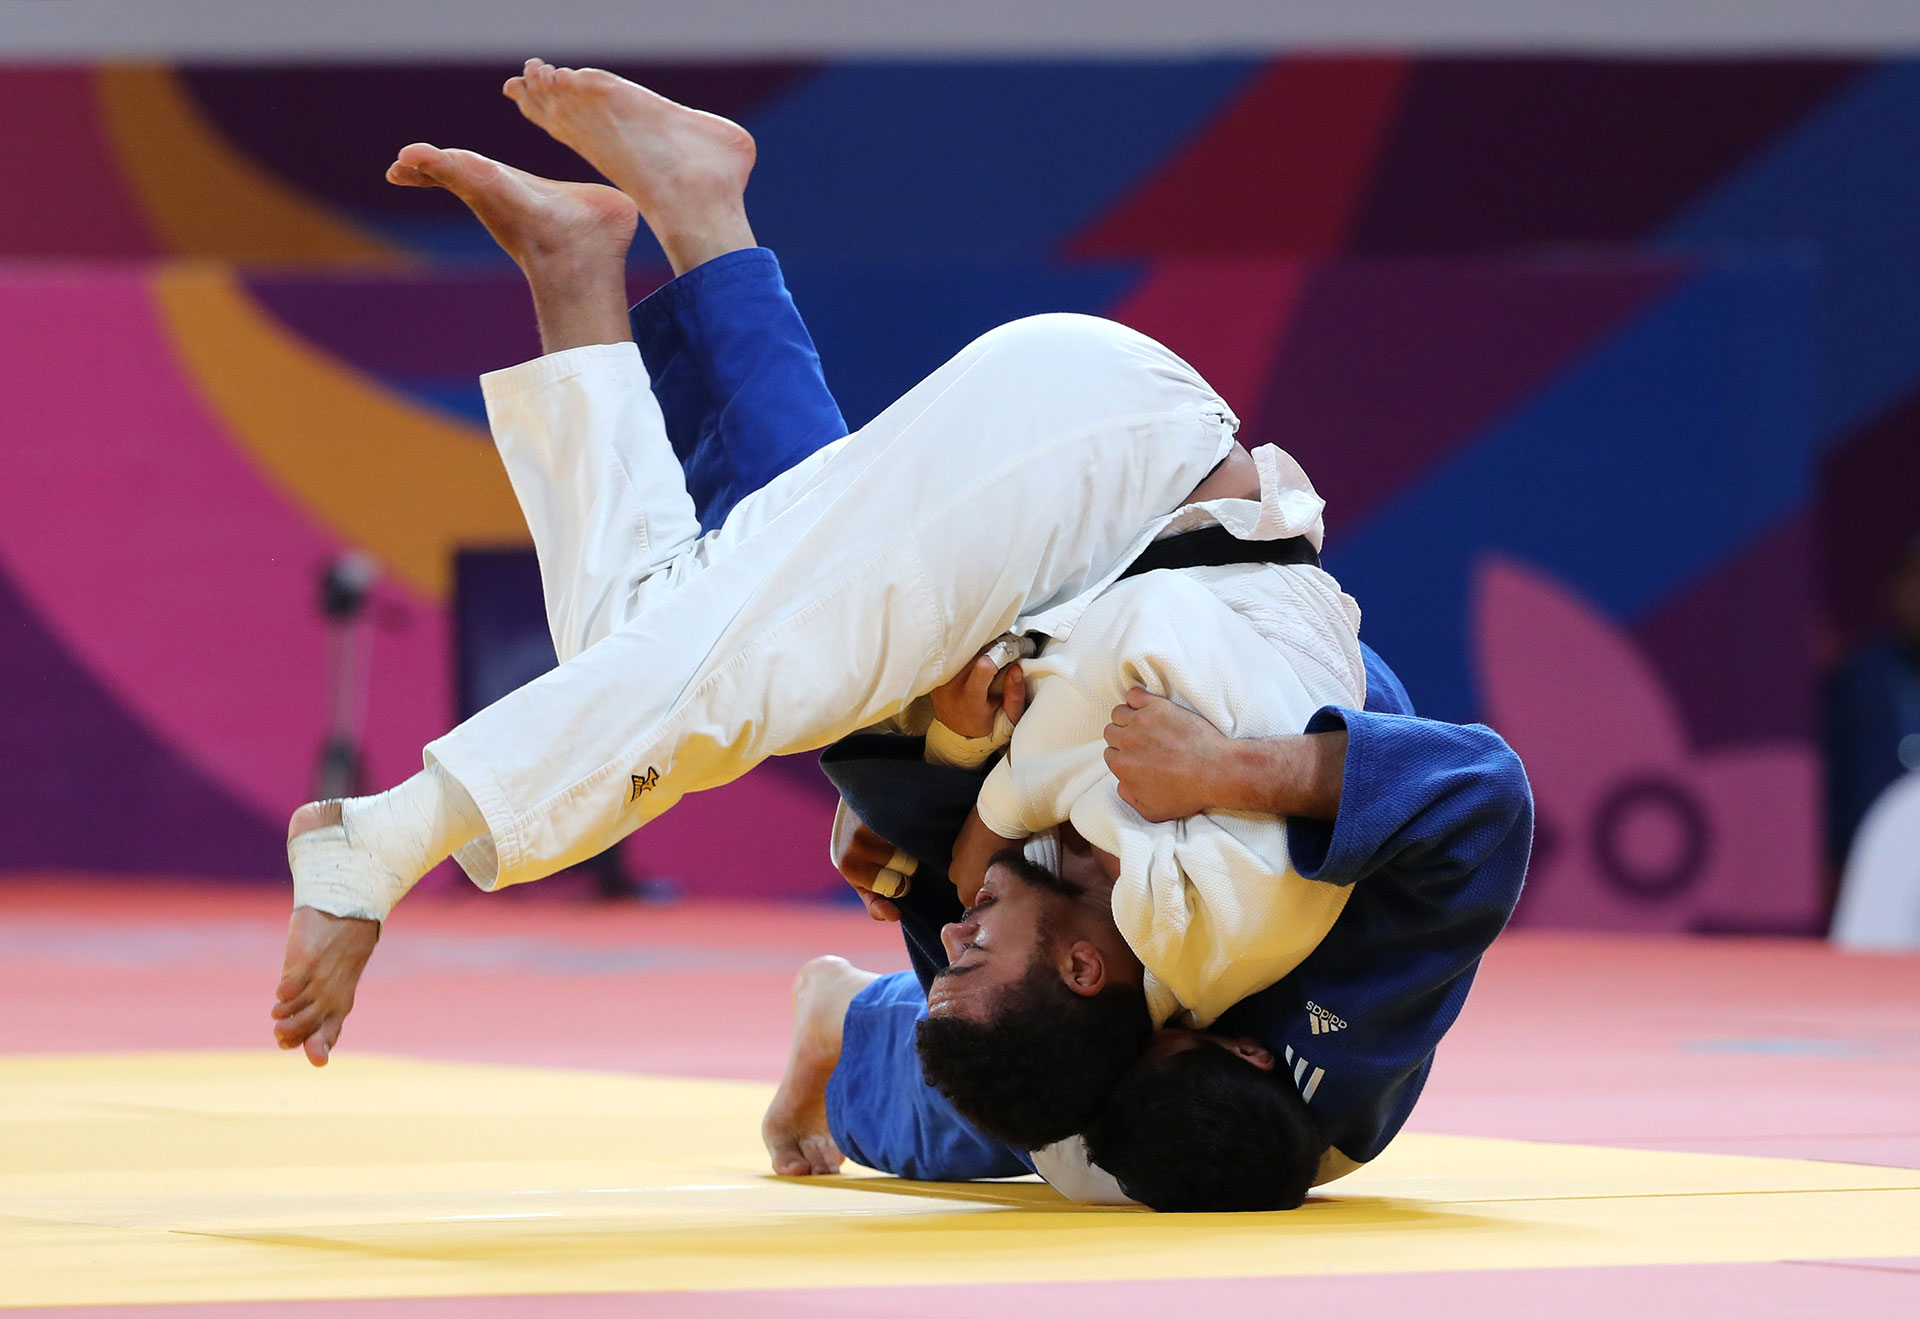 XVIII Pan American Games - Lima 2019 - Judo - Men's -100 kg Gold Medal Match - Villa Deportiva Nacional, Videna, Lima, Peru - August 11, 2019 LA Smith of the U.S. and Chile's Thomas Briceno in action. REUTERS/Sergio Moraes